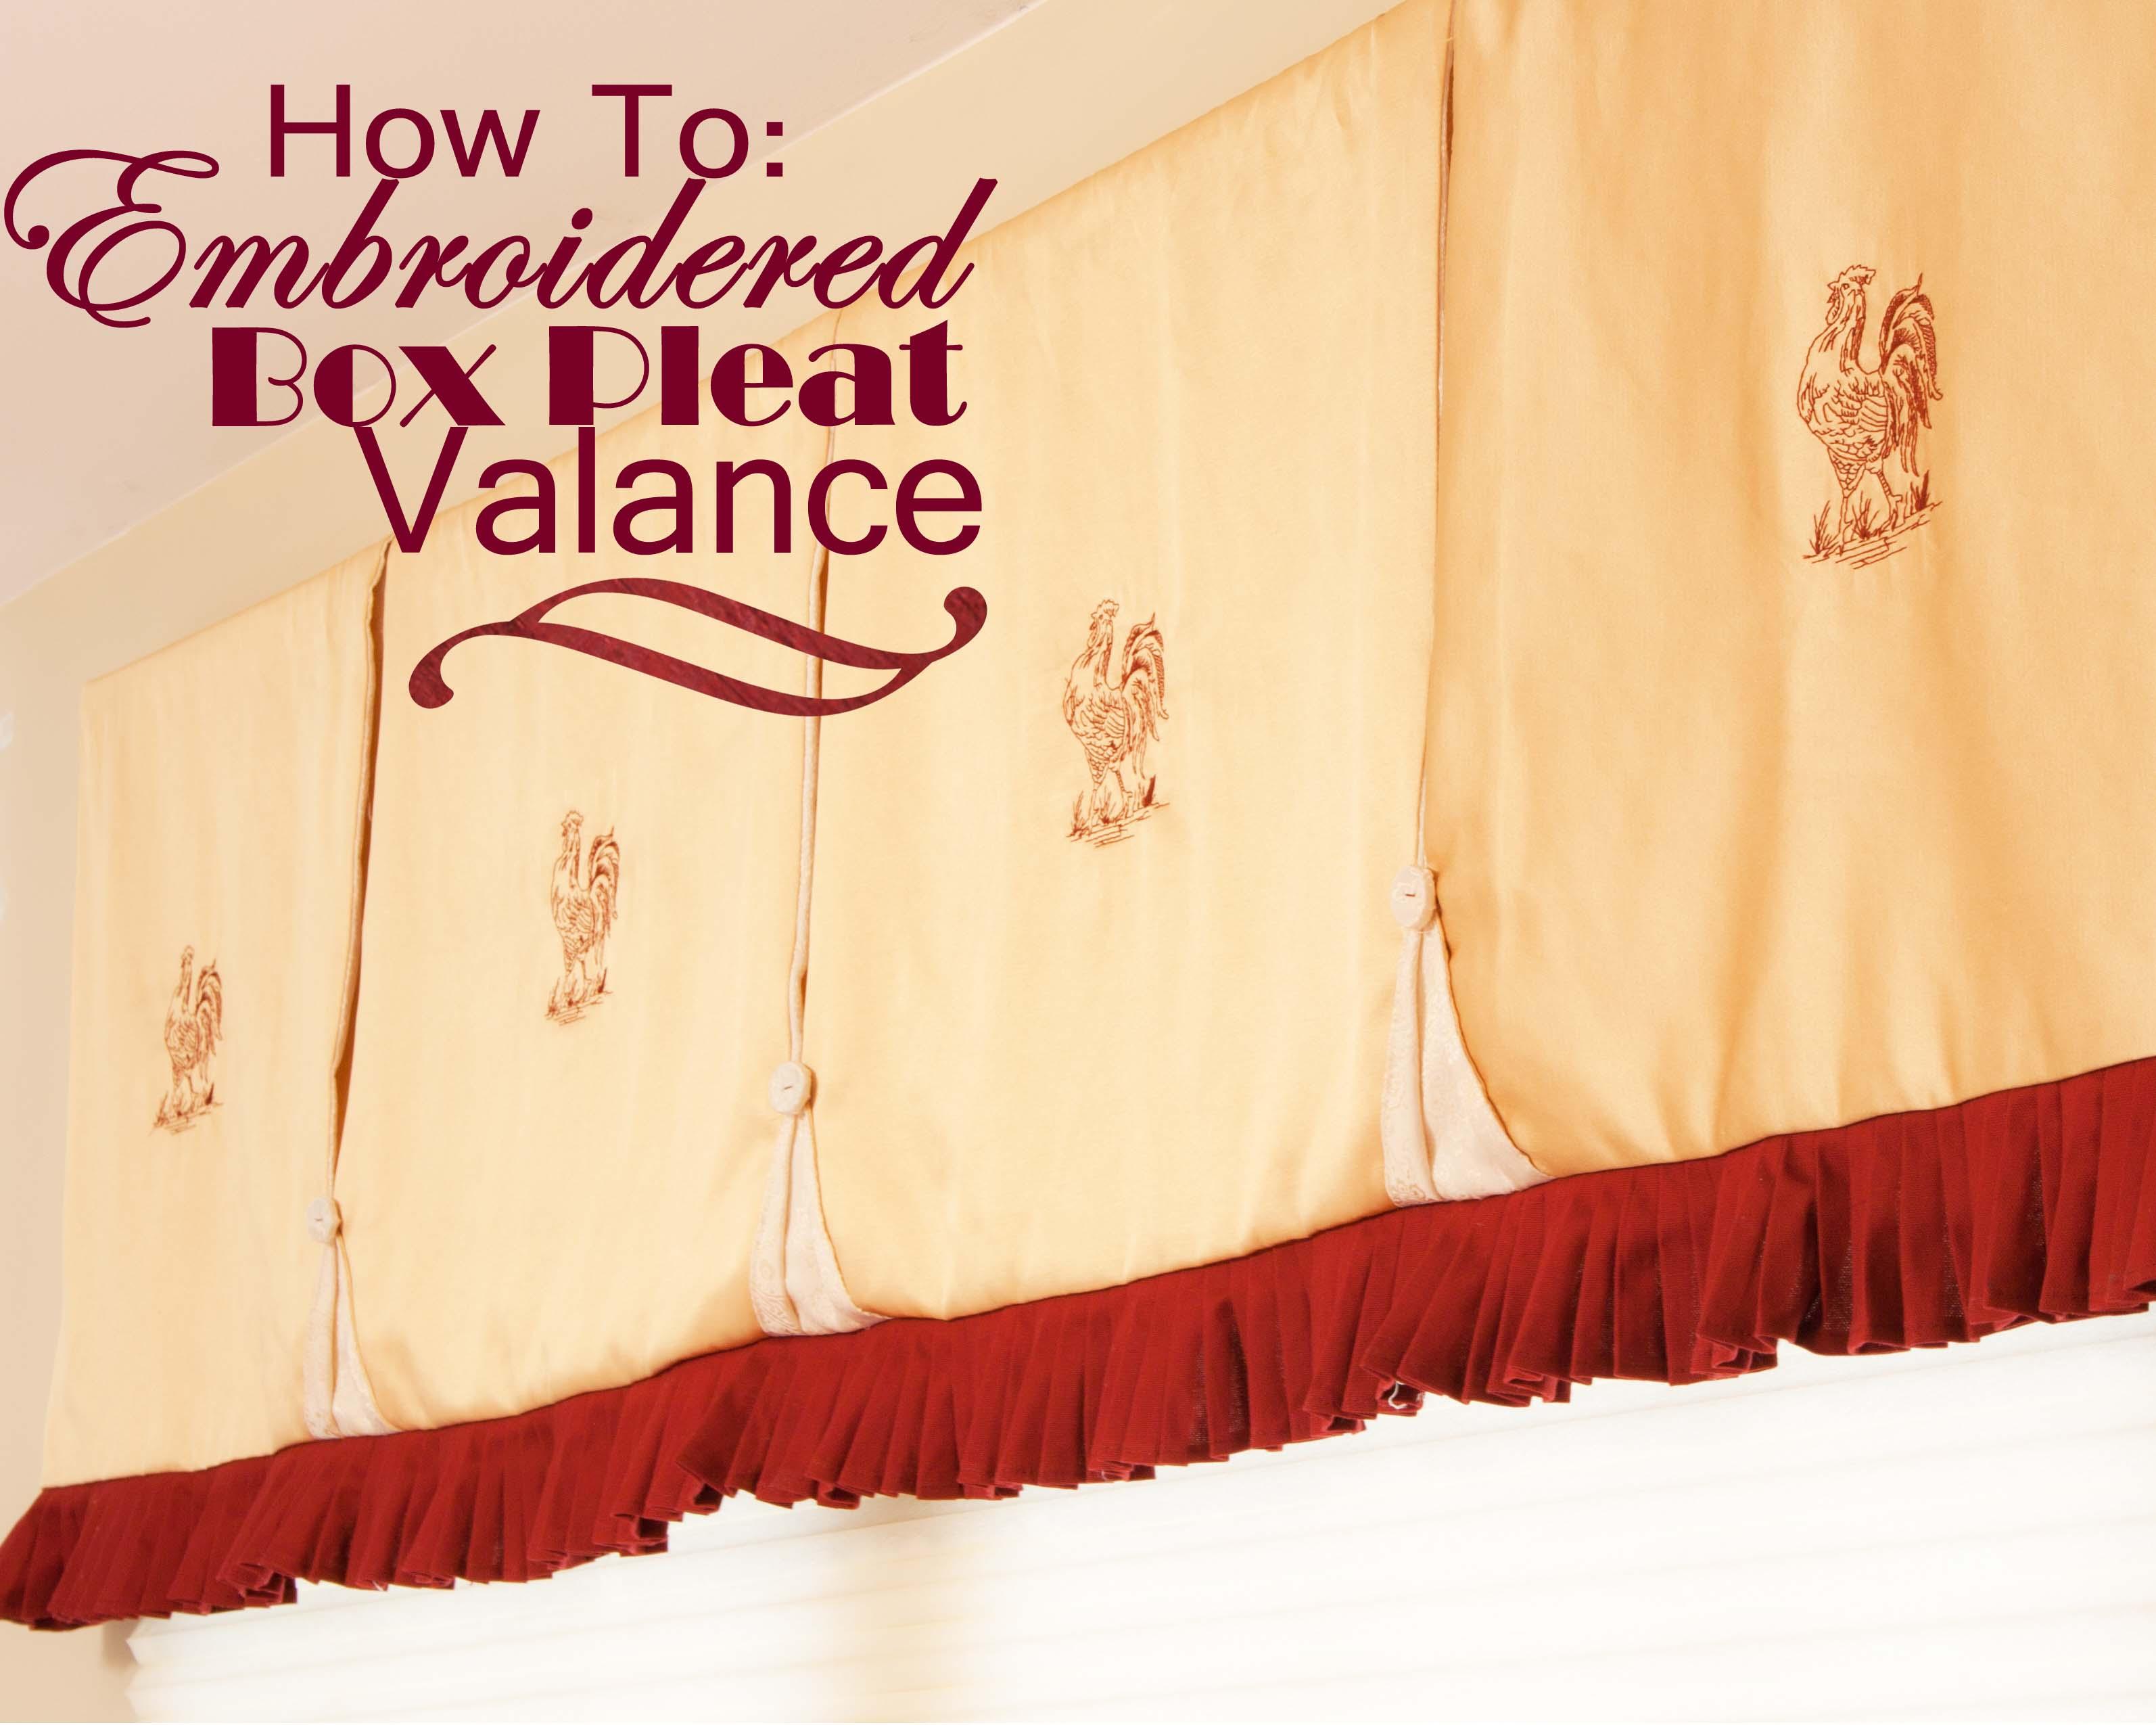 box valance pleat